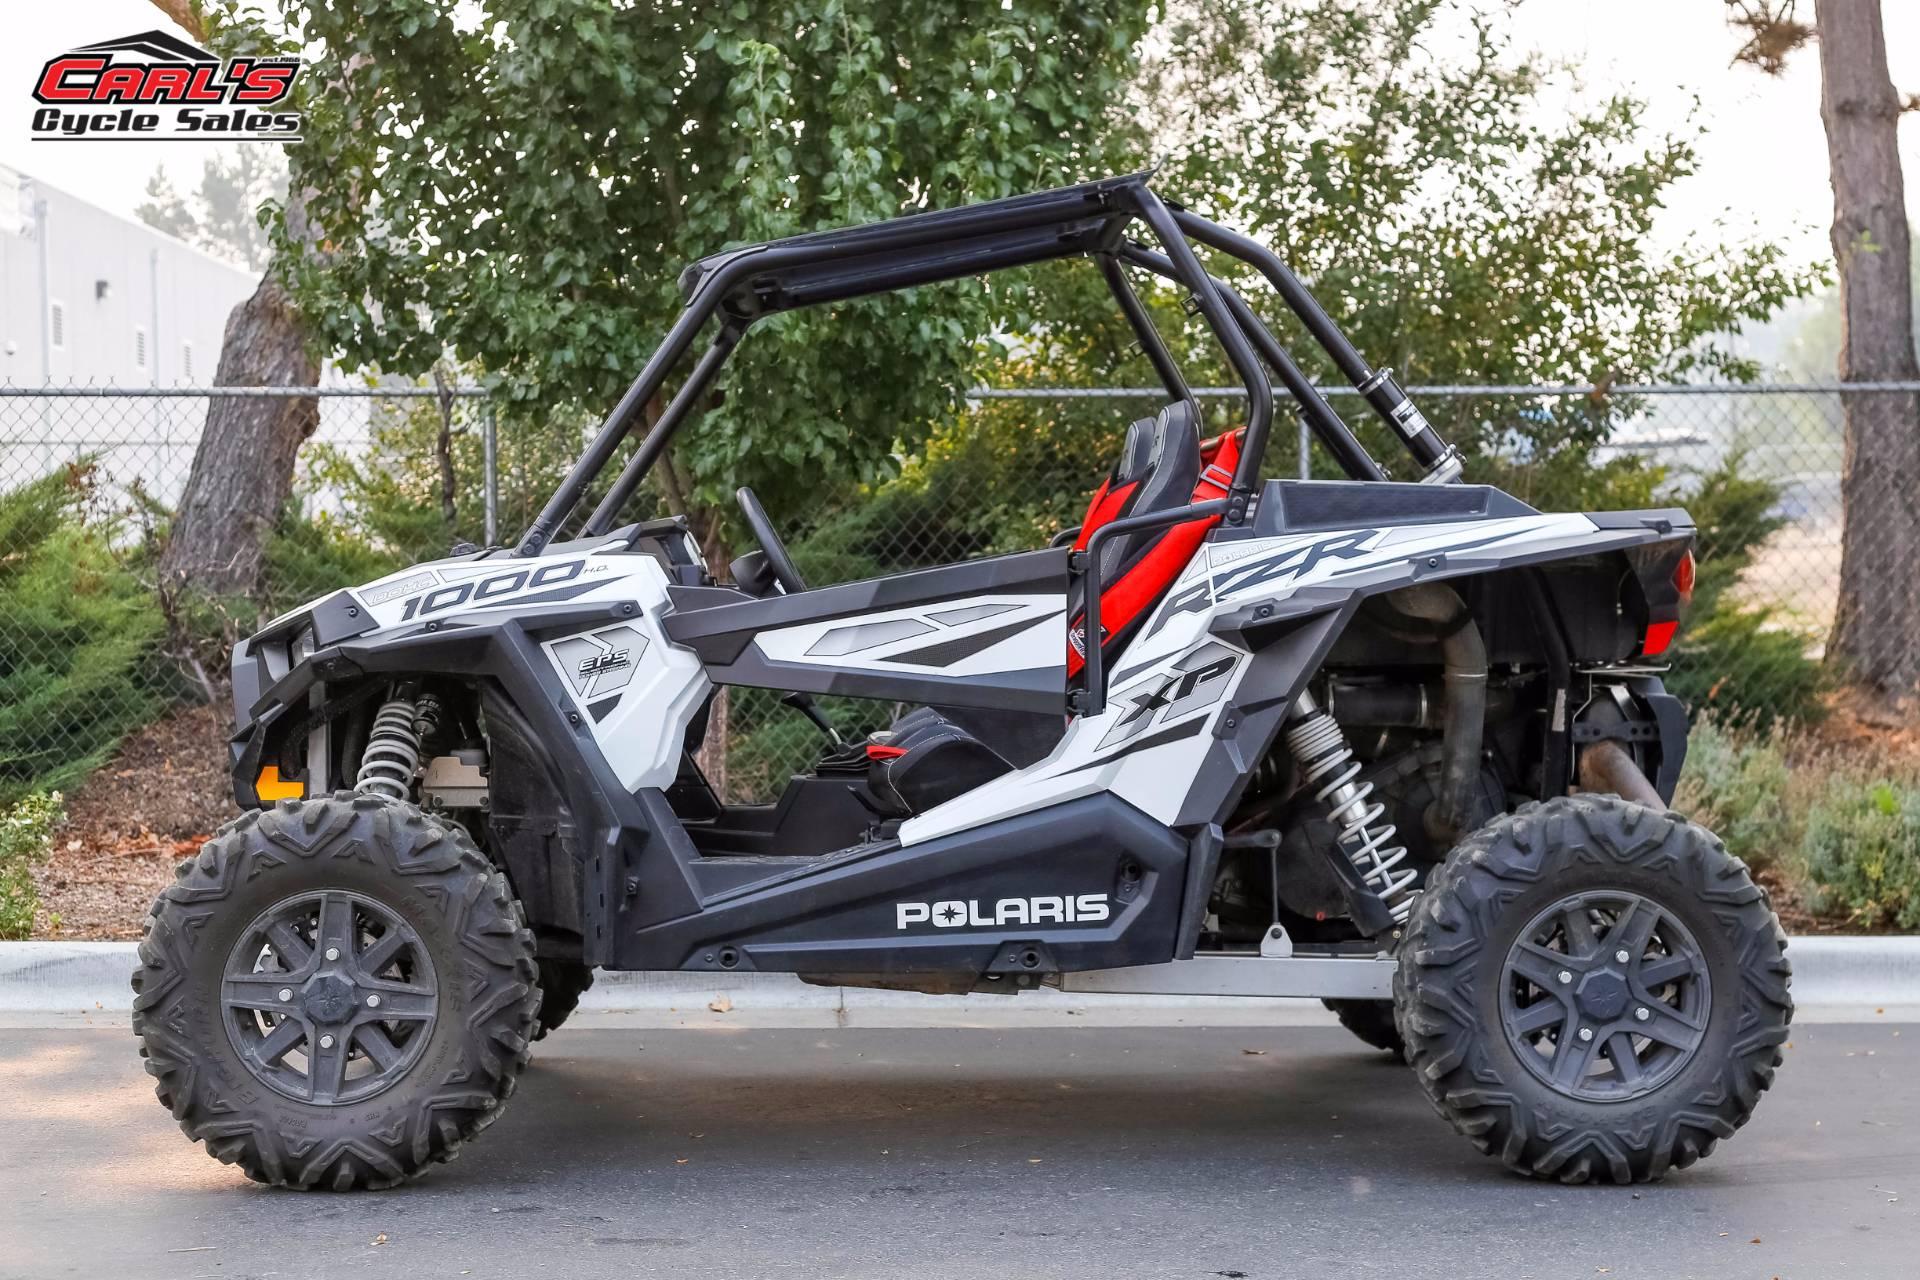 2015 Polaris RZR XP 1000 EPS for sale 67792